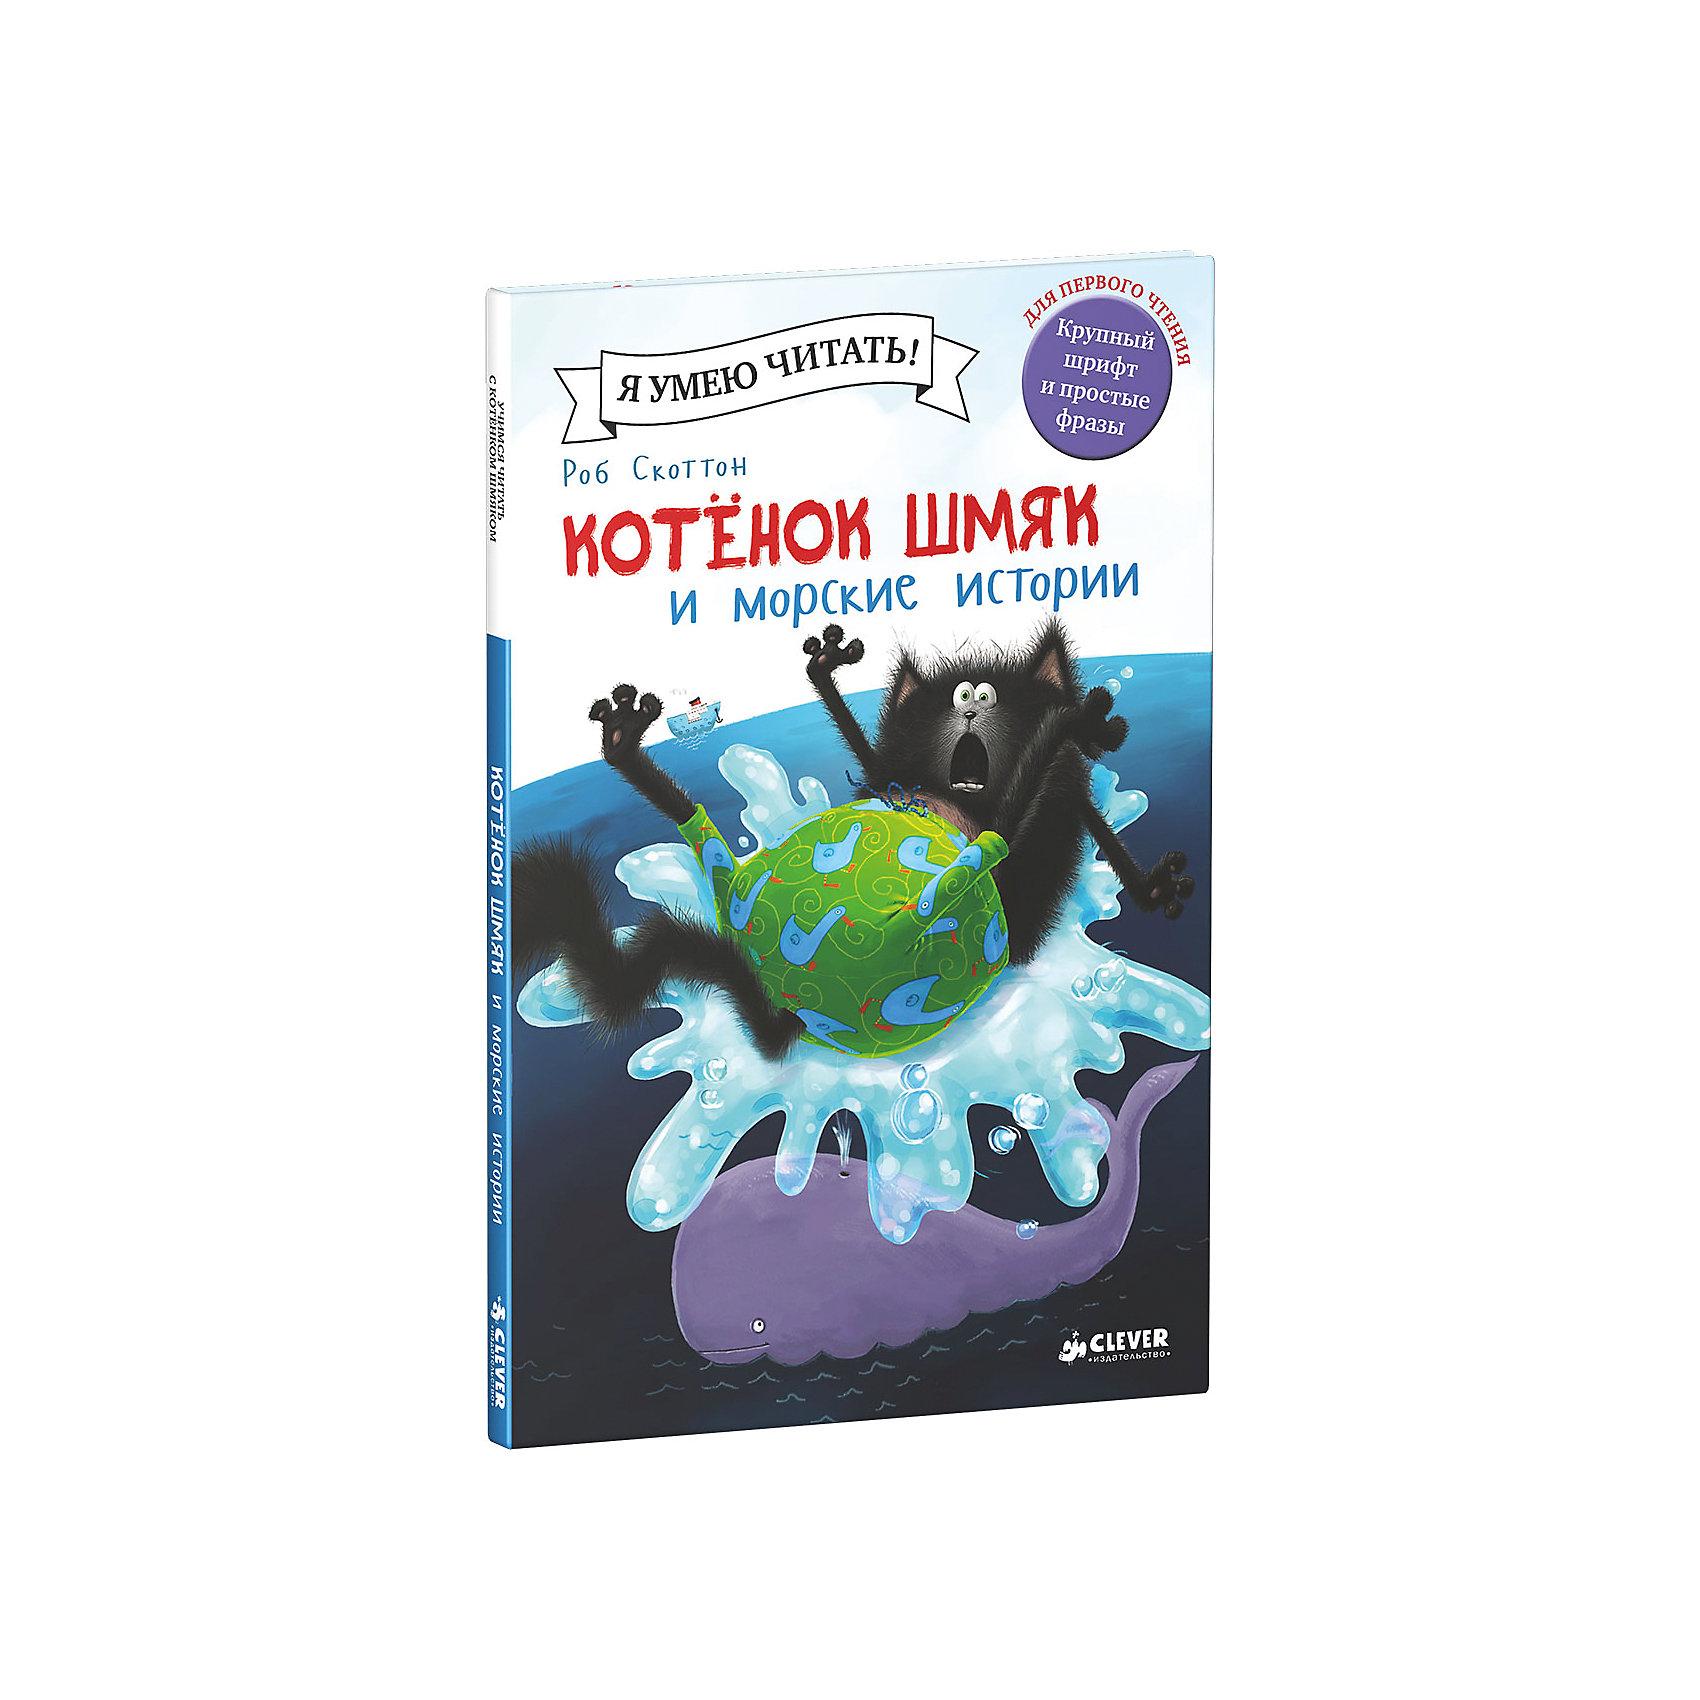 Clever Книга Котенок Шмяк и морские истории, Роб Скоттон егерь последний билет в рай котенок